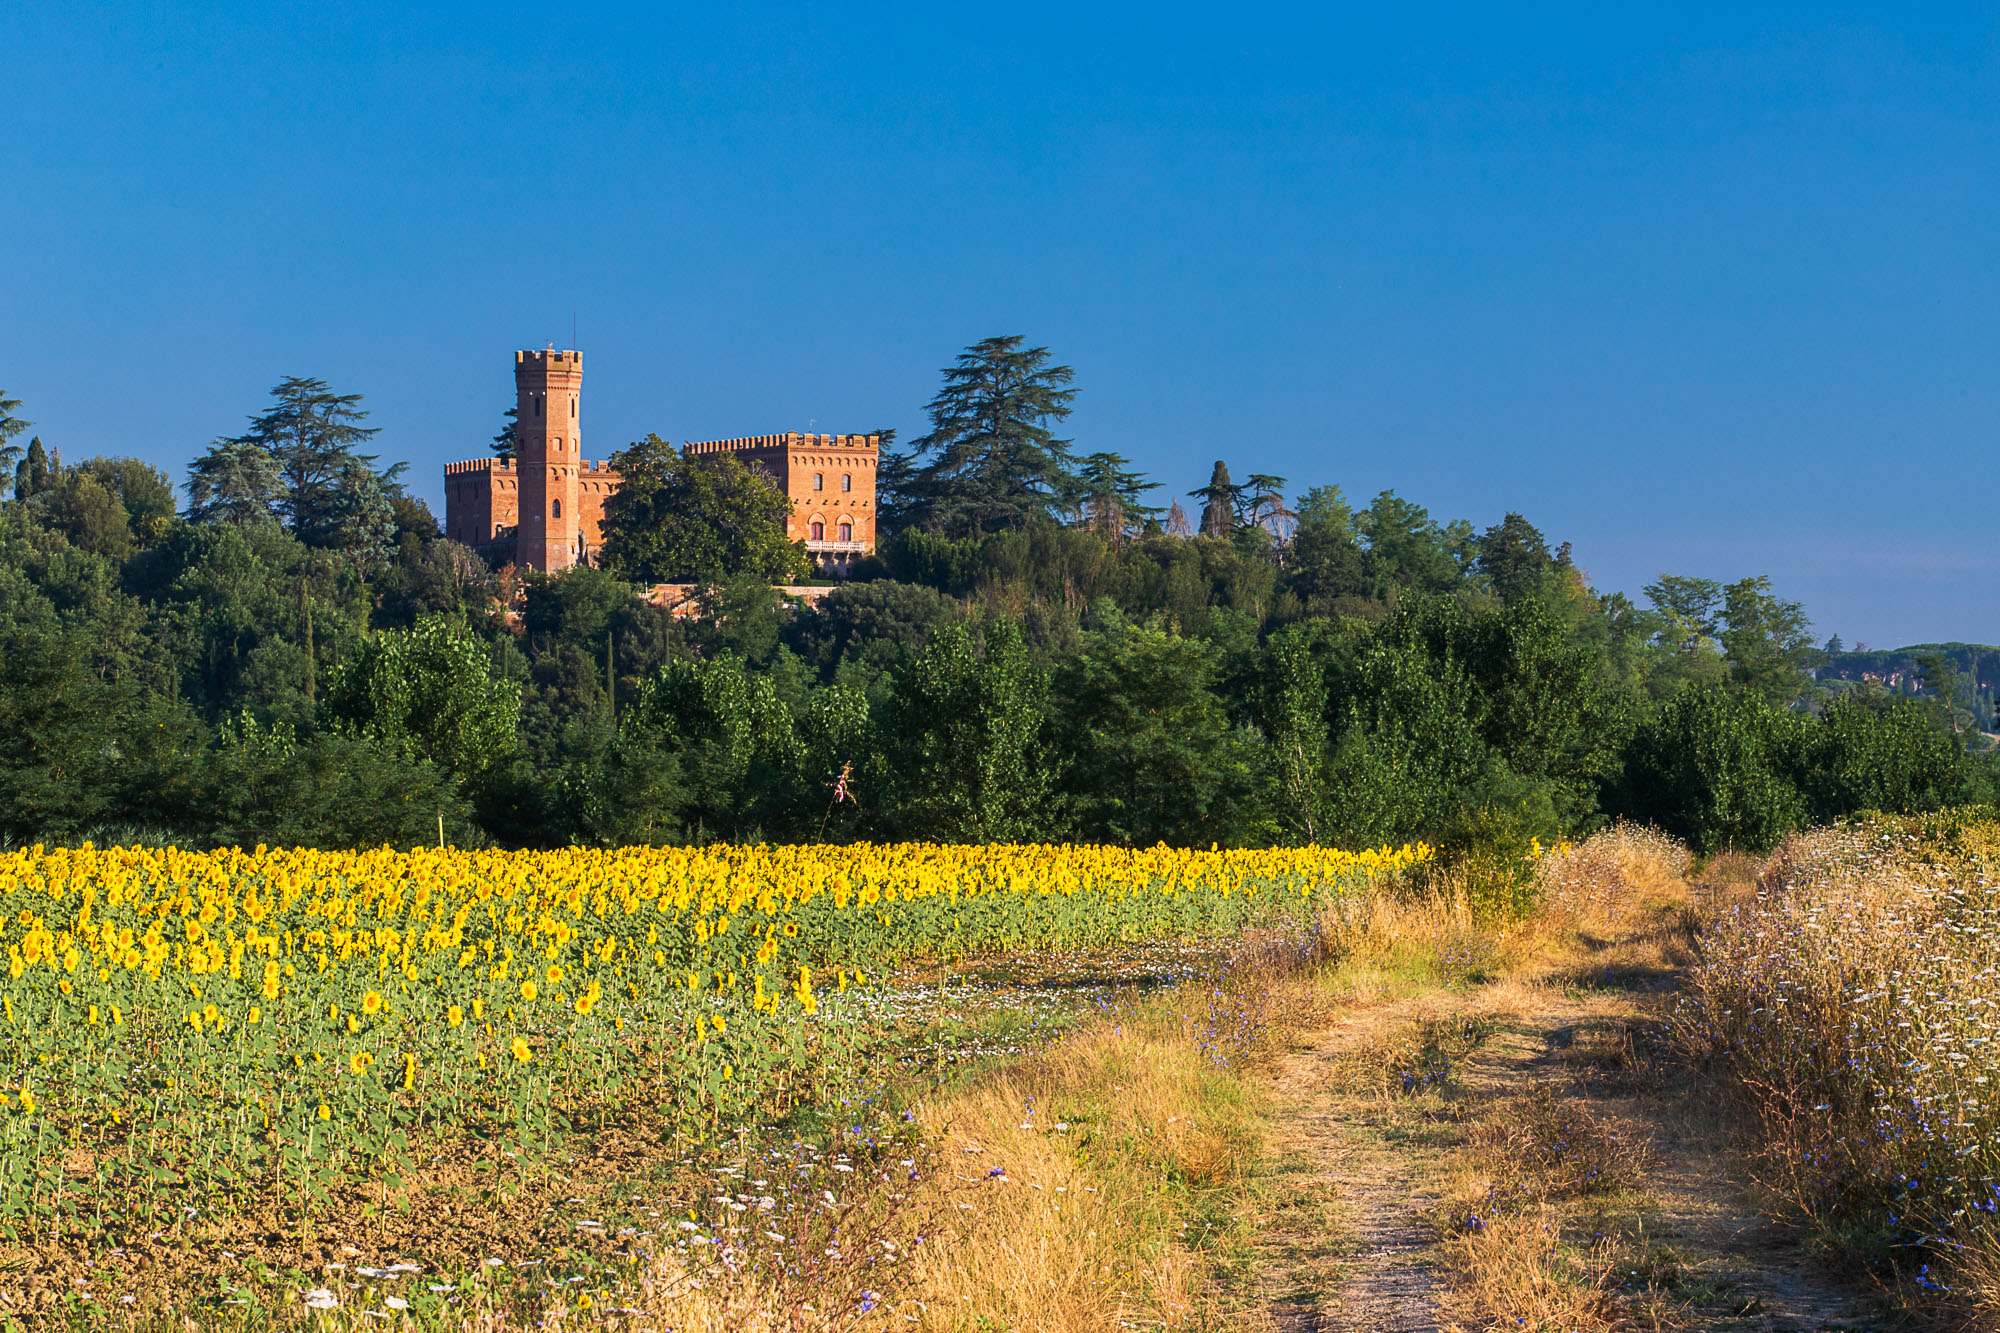 Tuscan Sunflowers, Italy